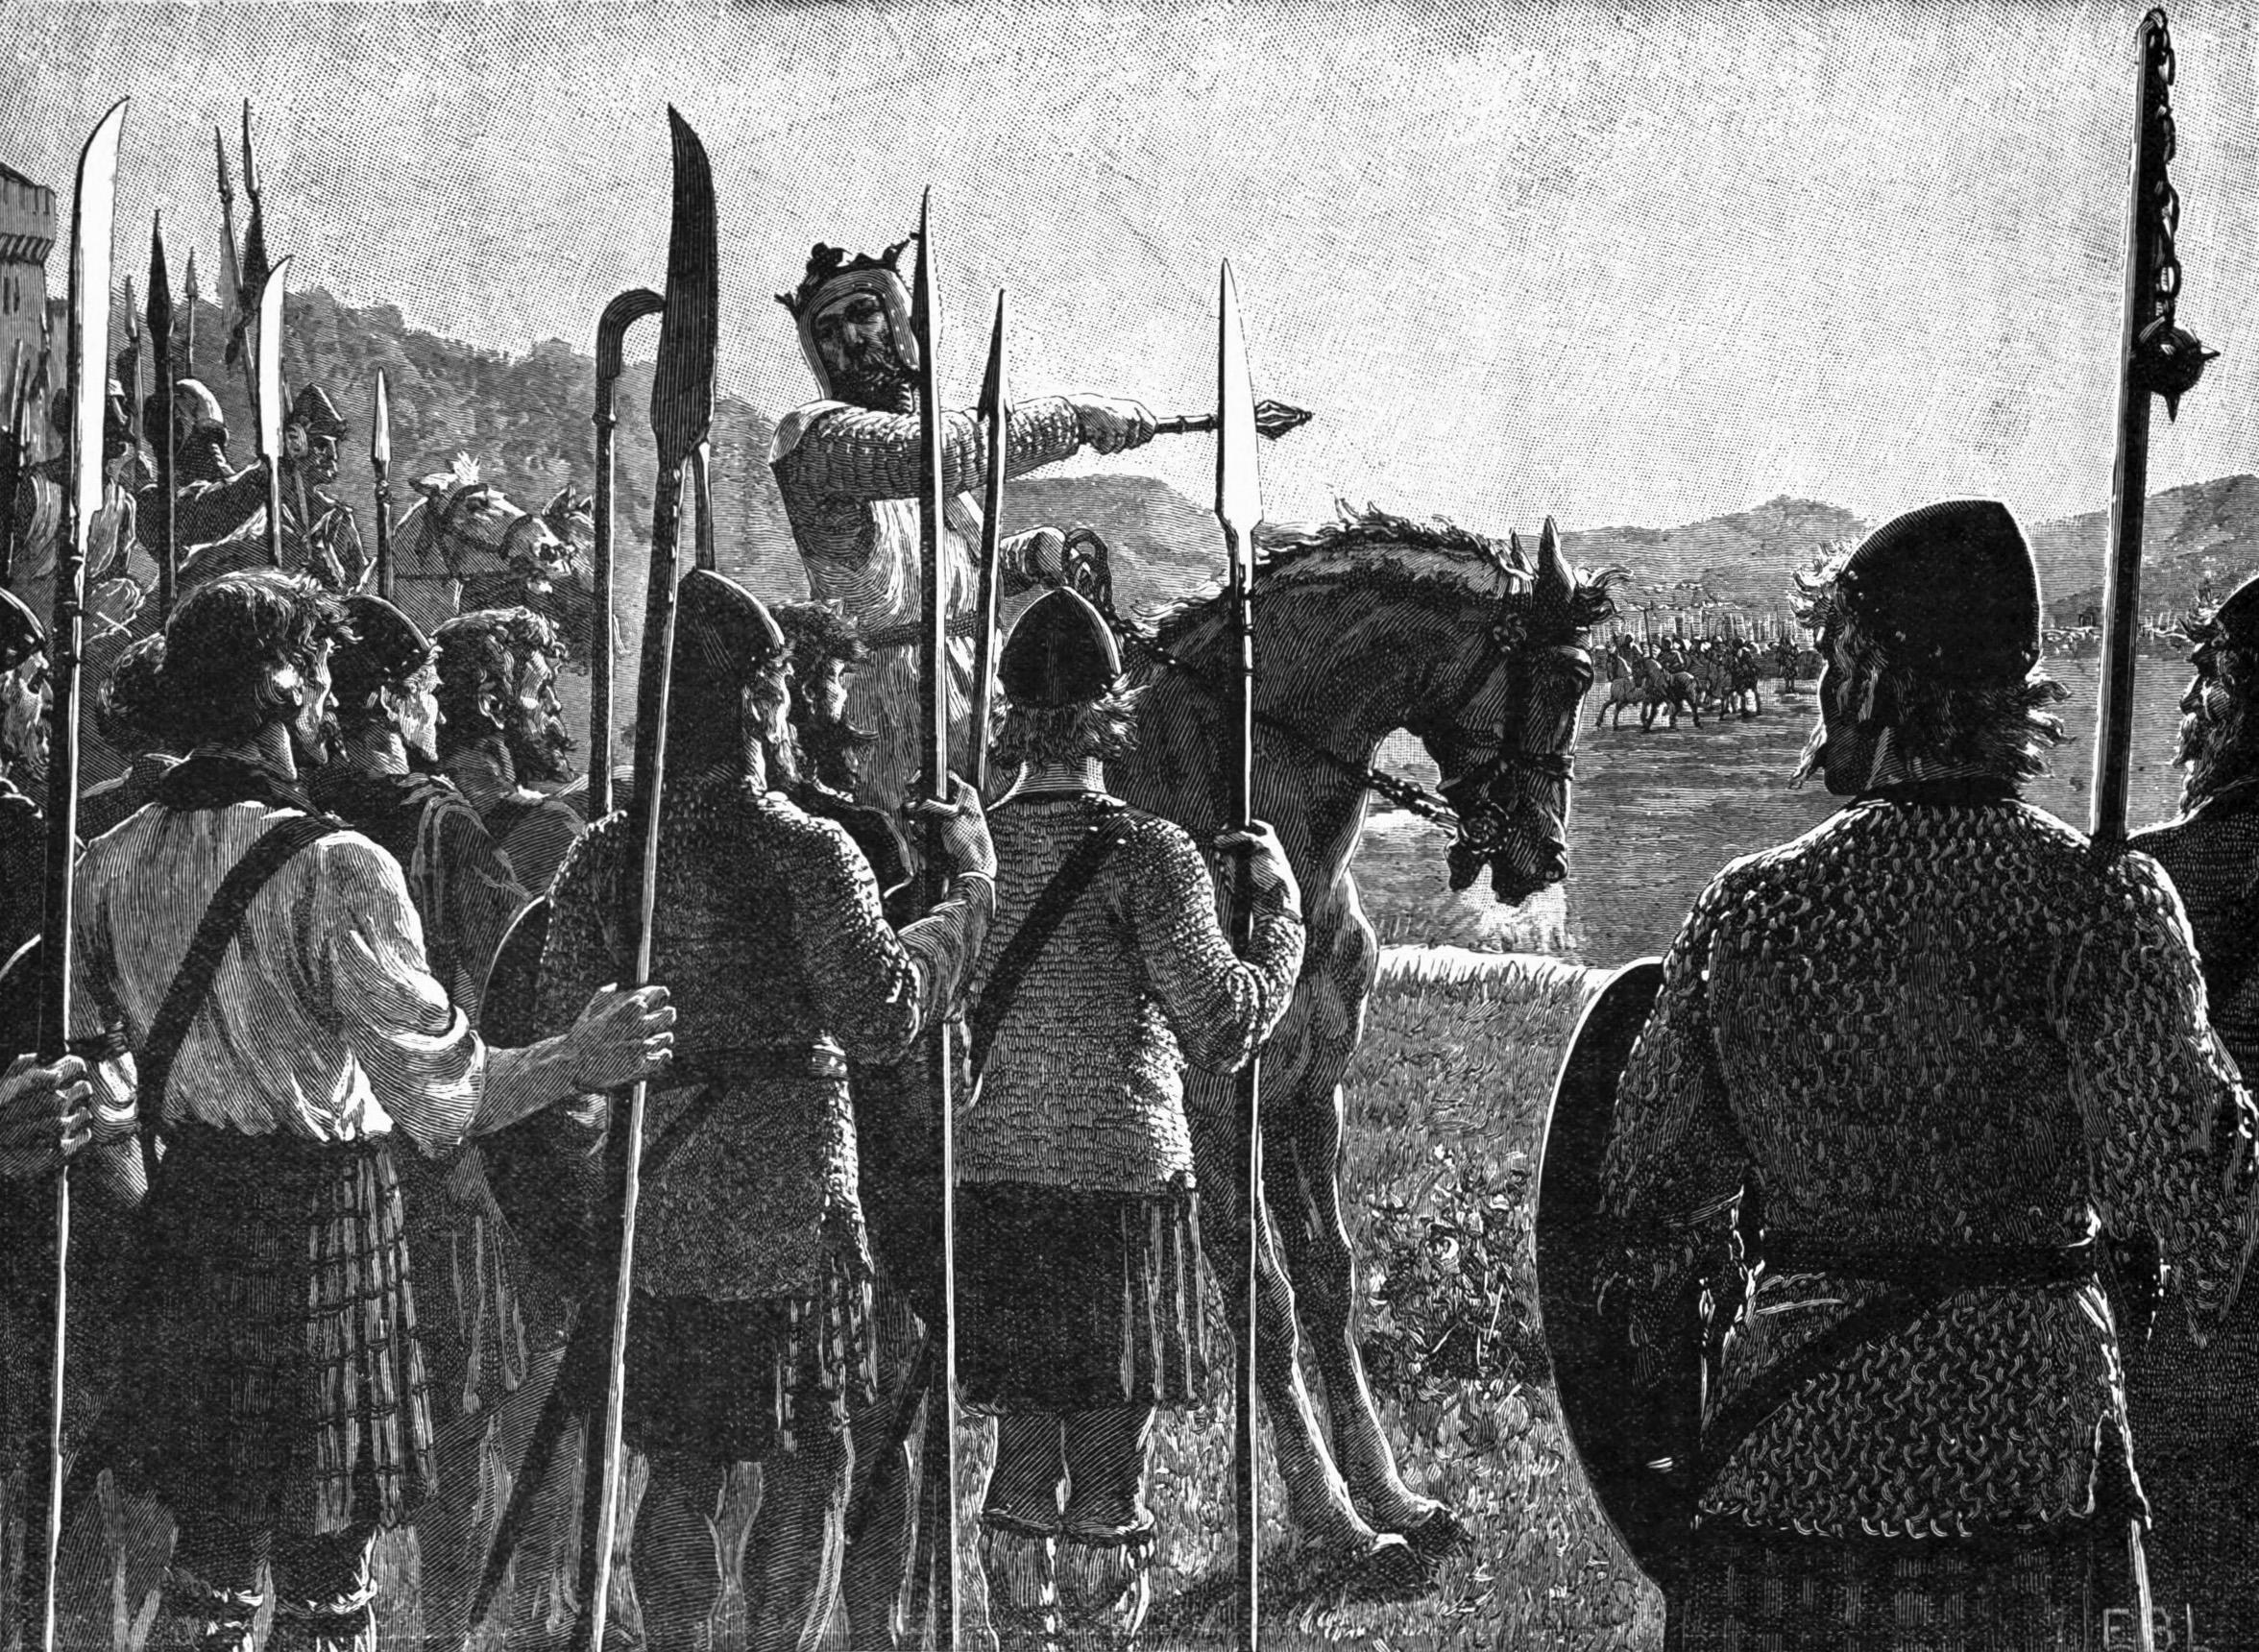 Batalla de Bannockburn Battle_of_Bannockburn_-_Bruce_addresses_troops